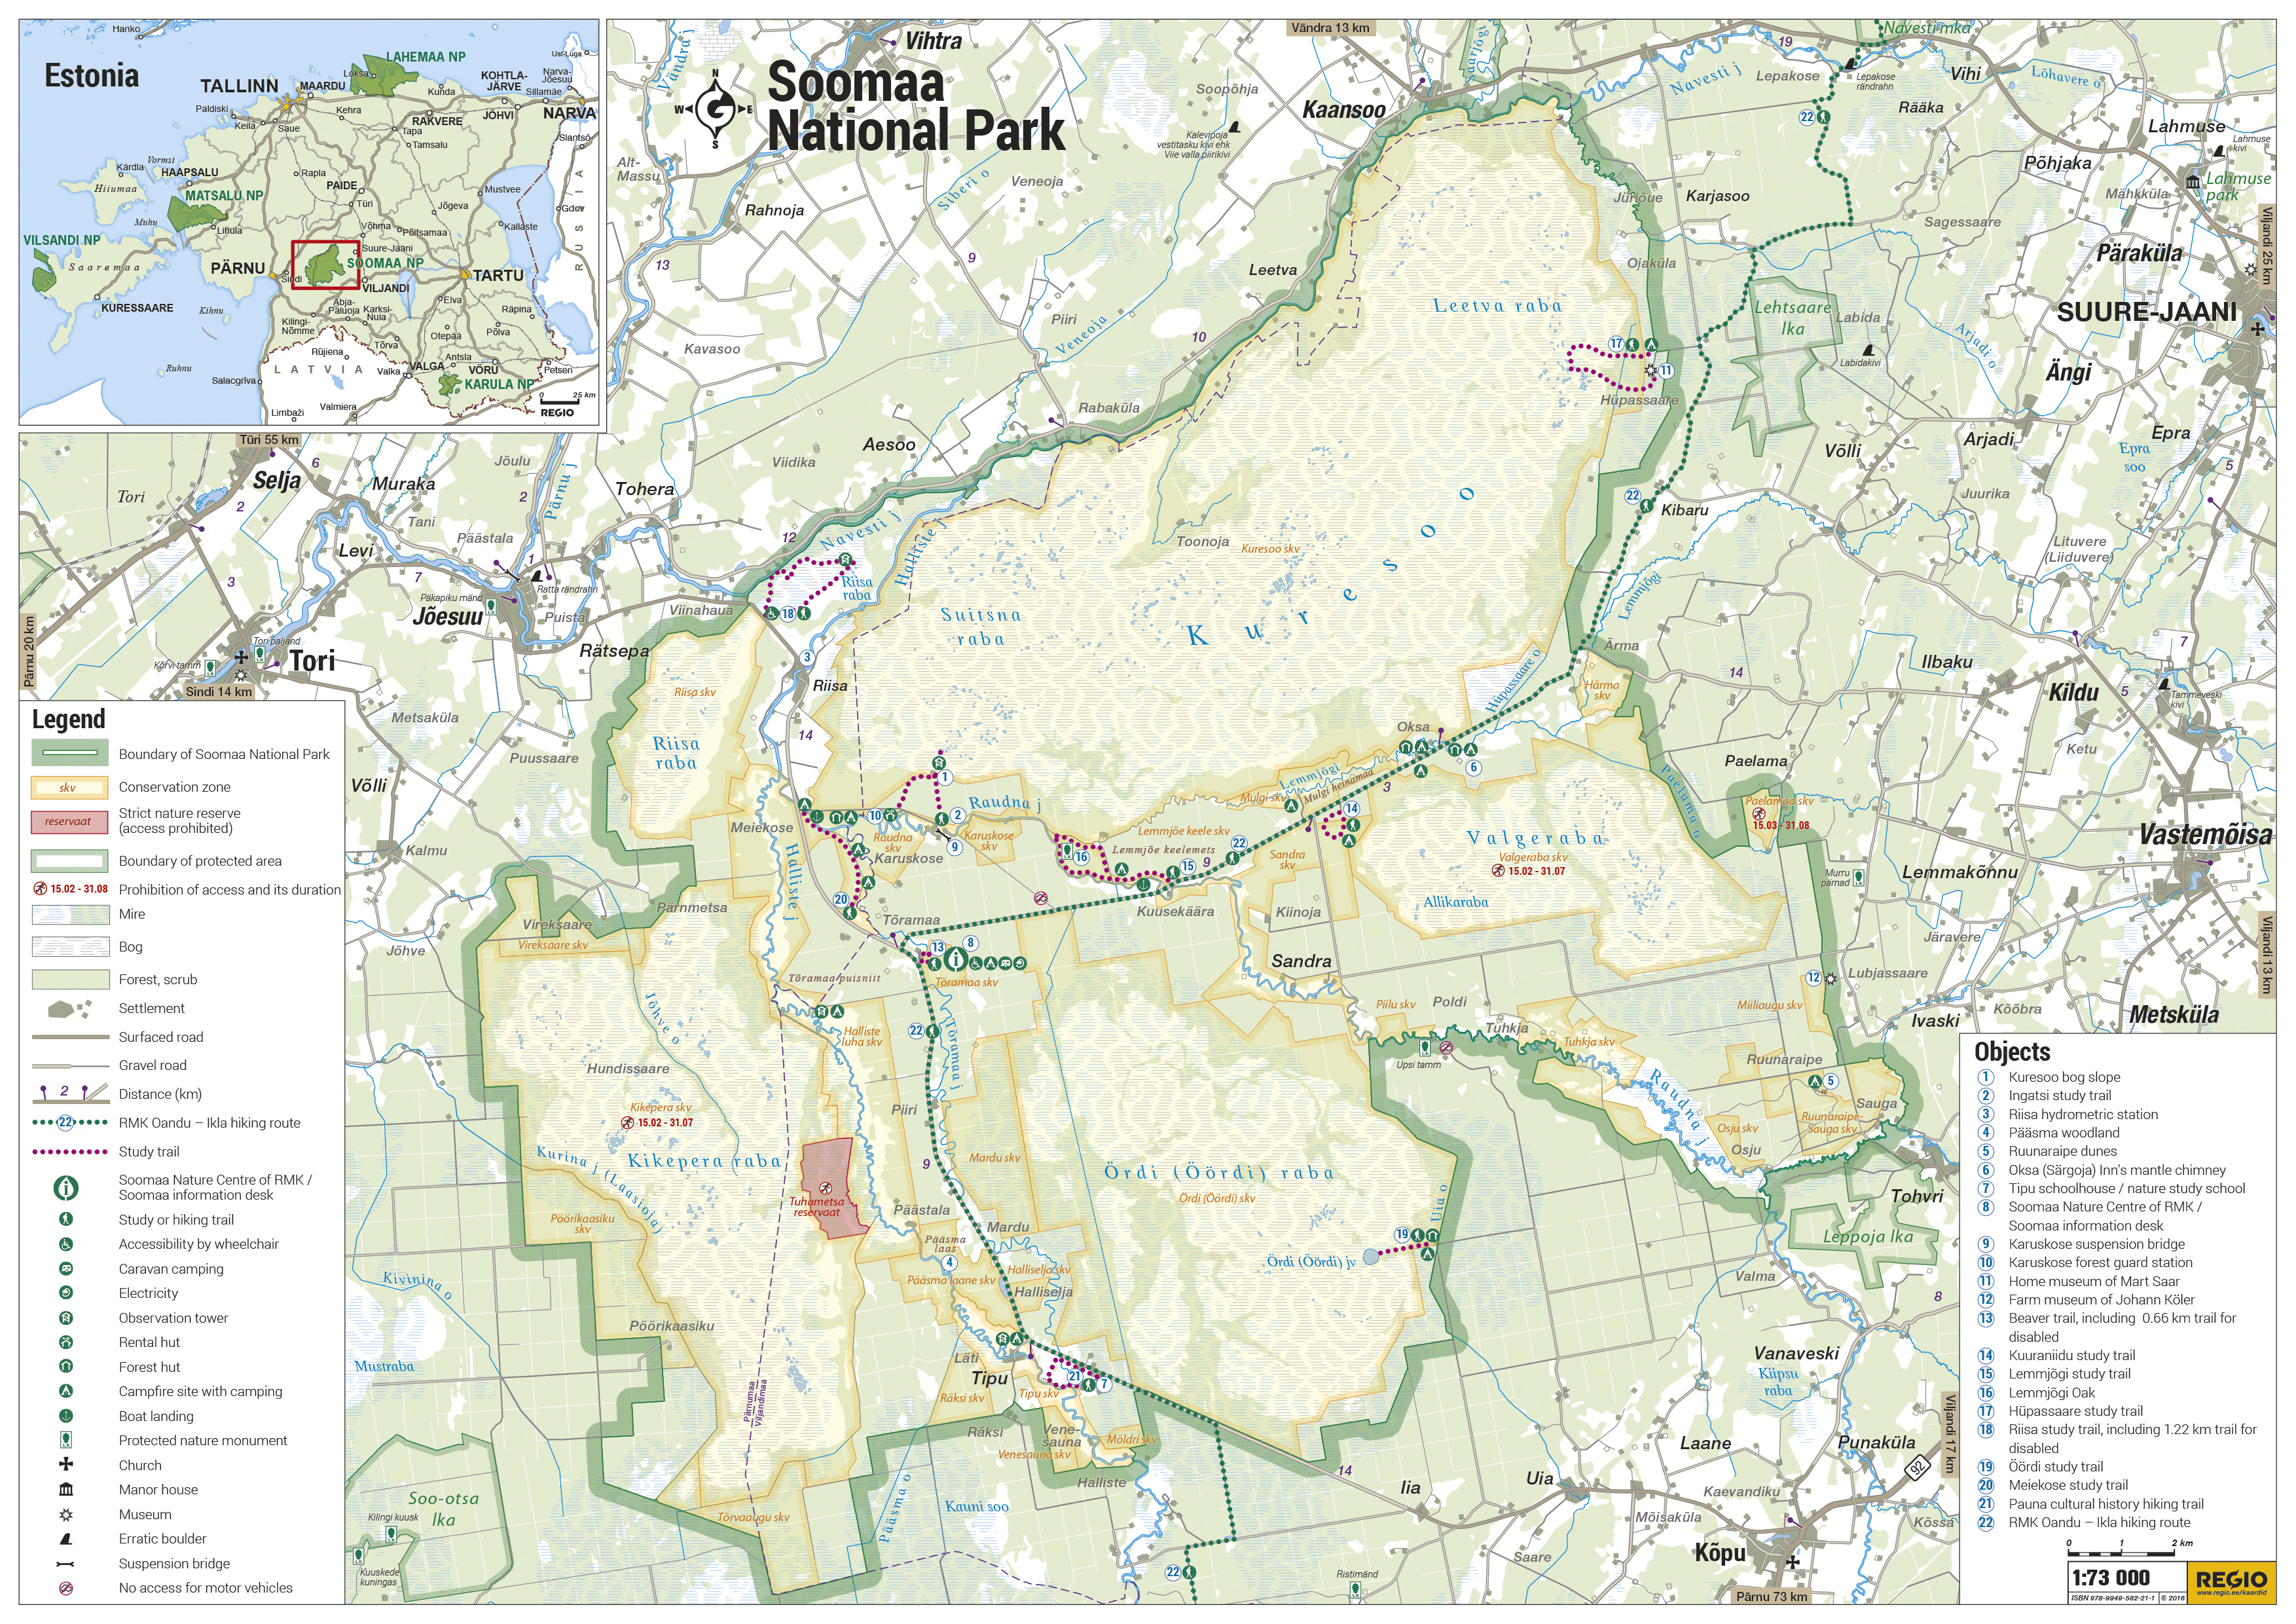 Map of Soomaa National Park